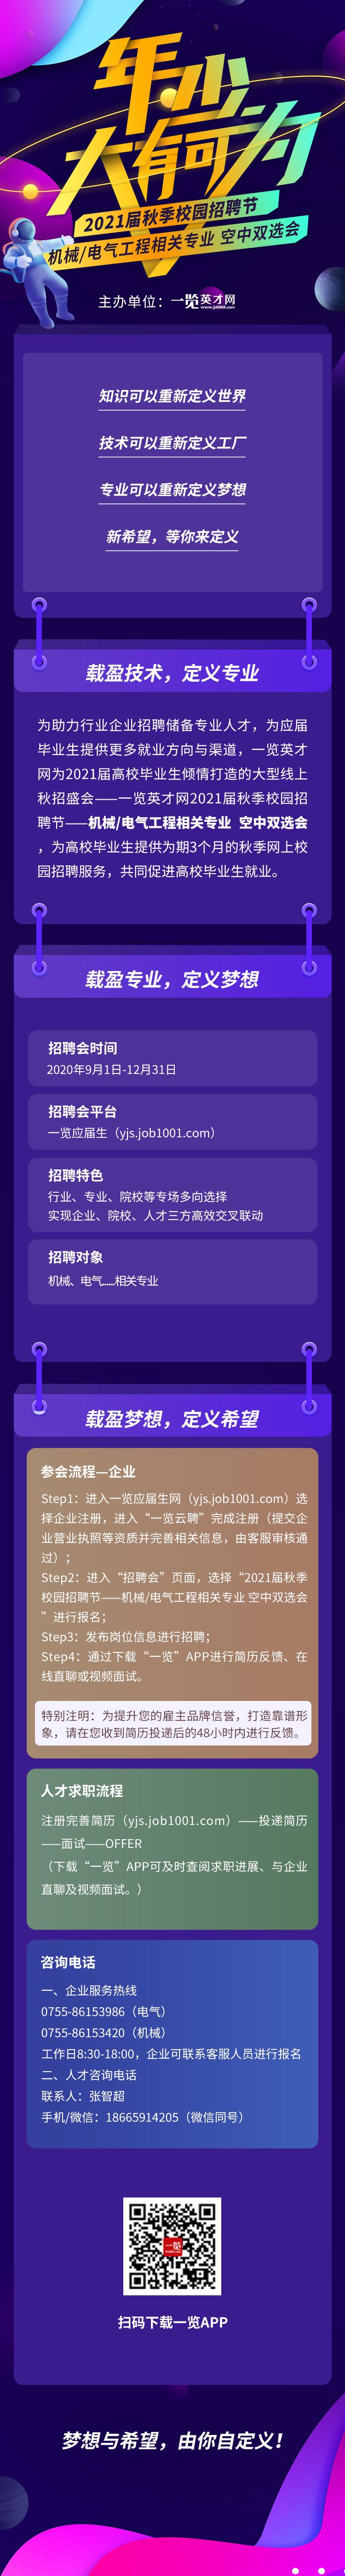 1598947674-6FDIV8I.jpg